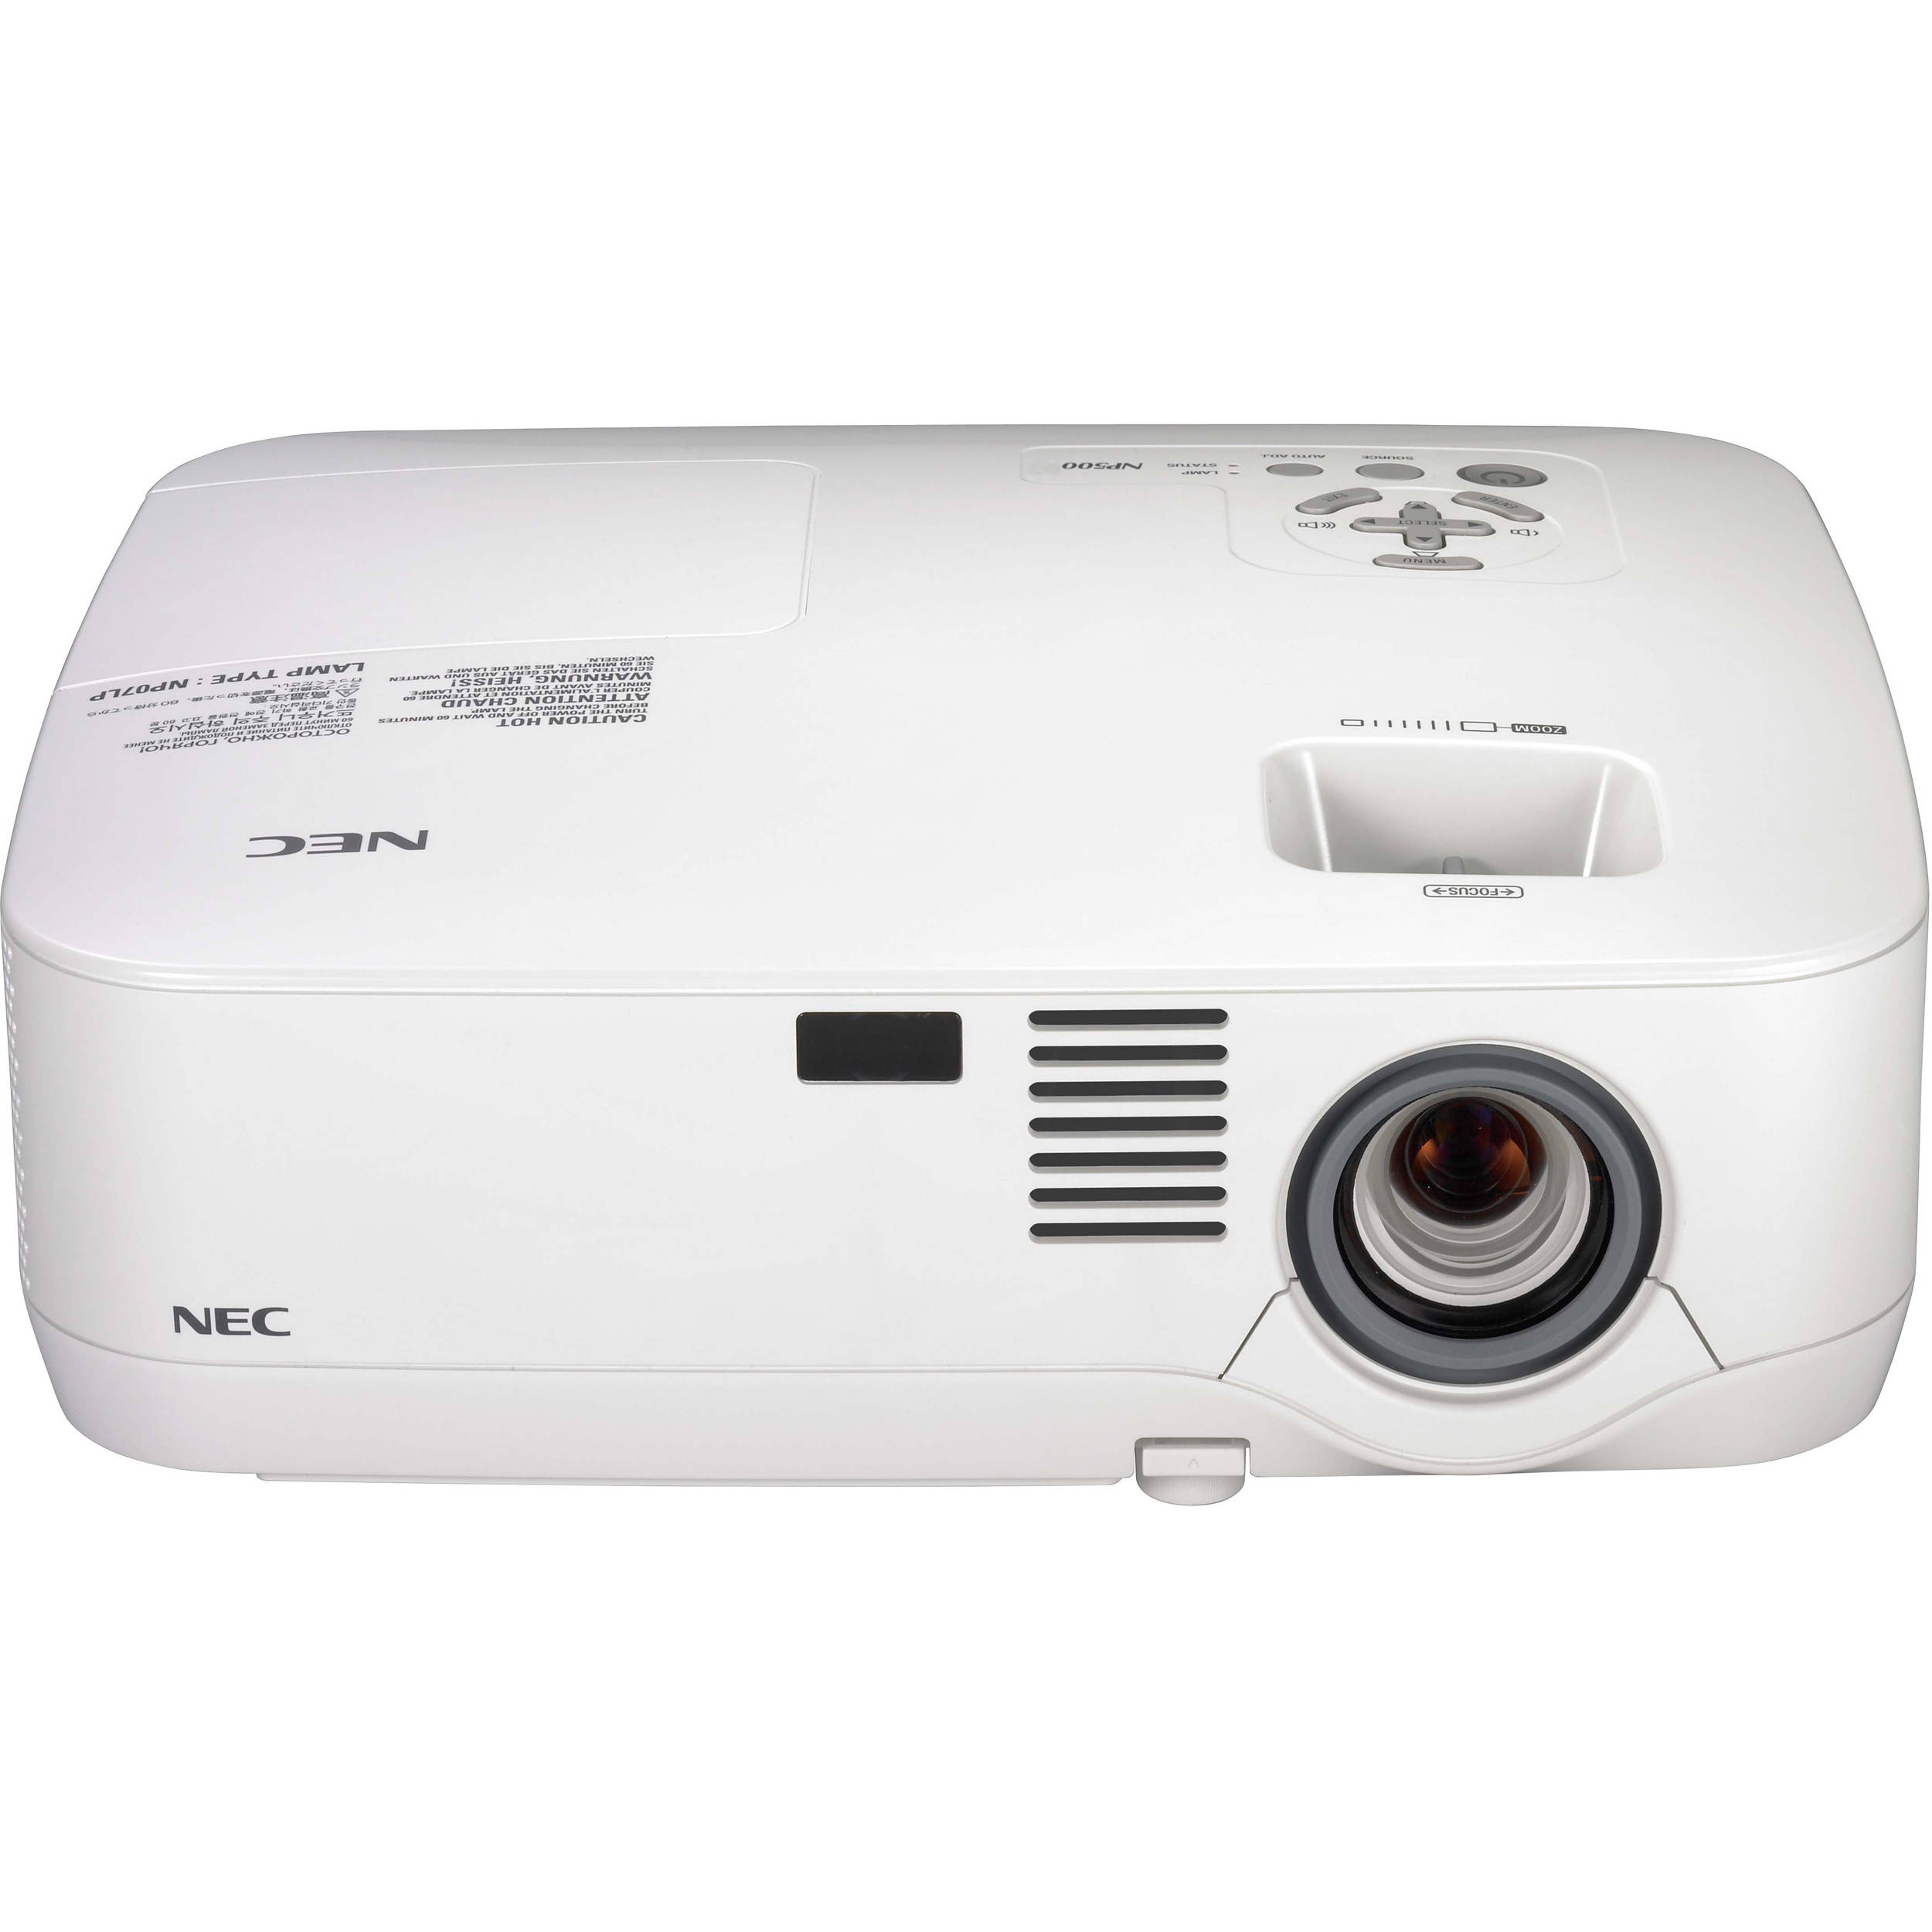 NEC NP500 LCD XGA 3000 Lumens Projector NP500 B&H Photo Video